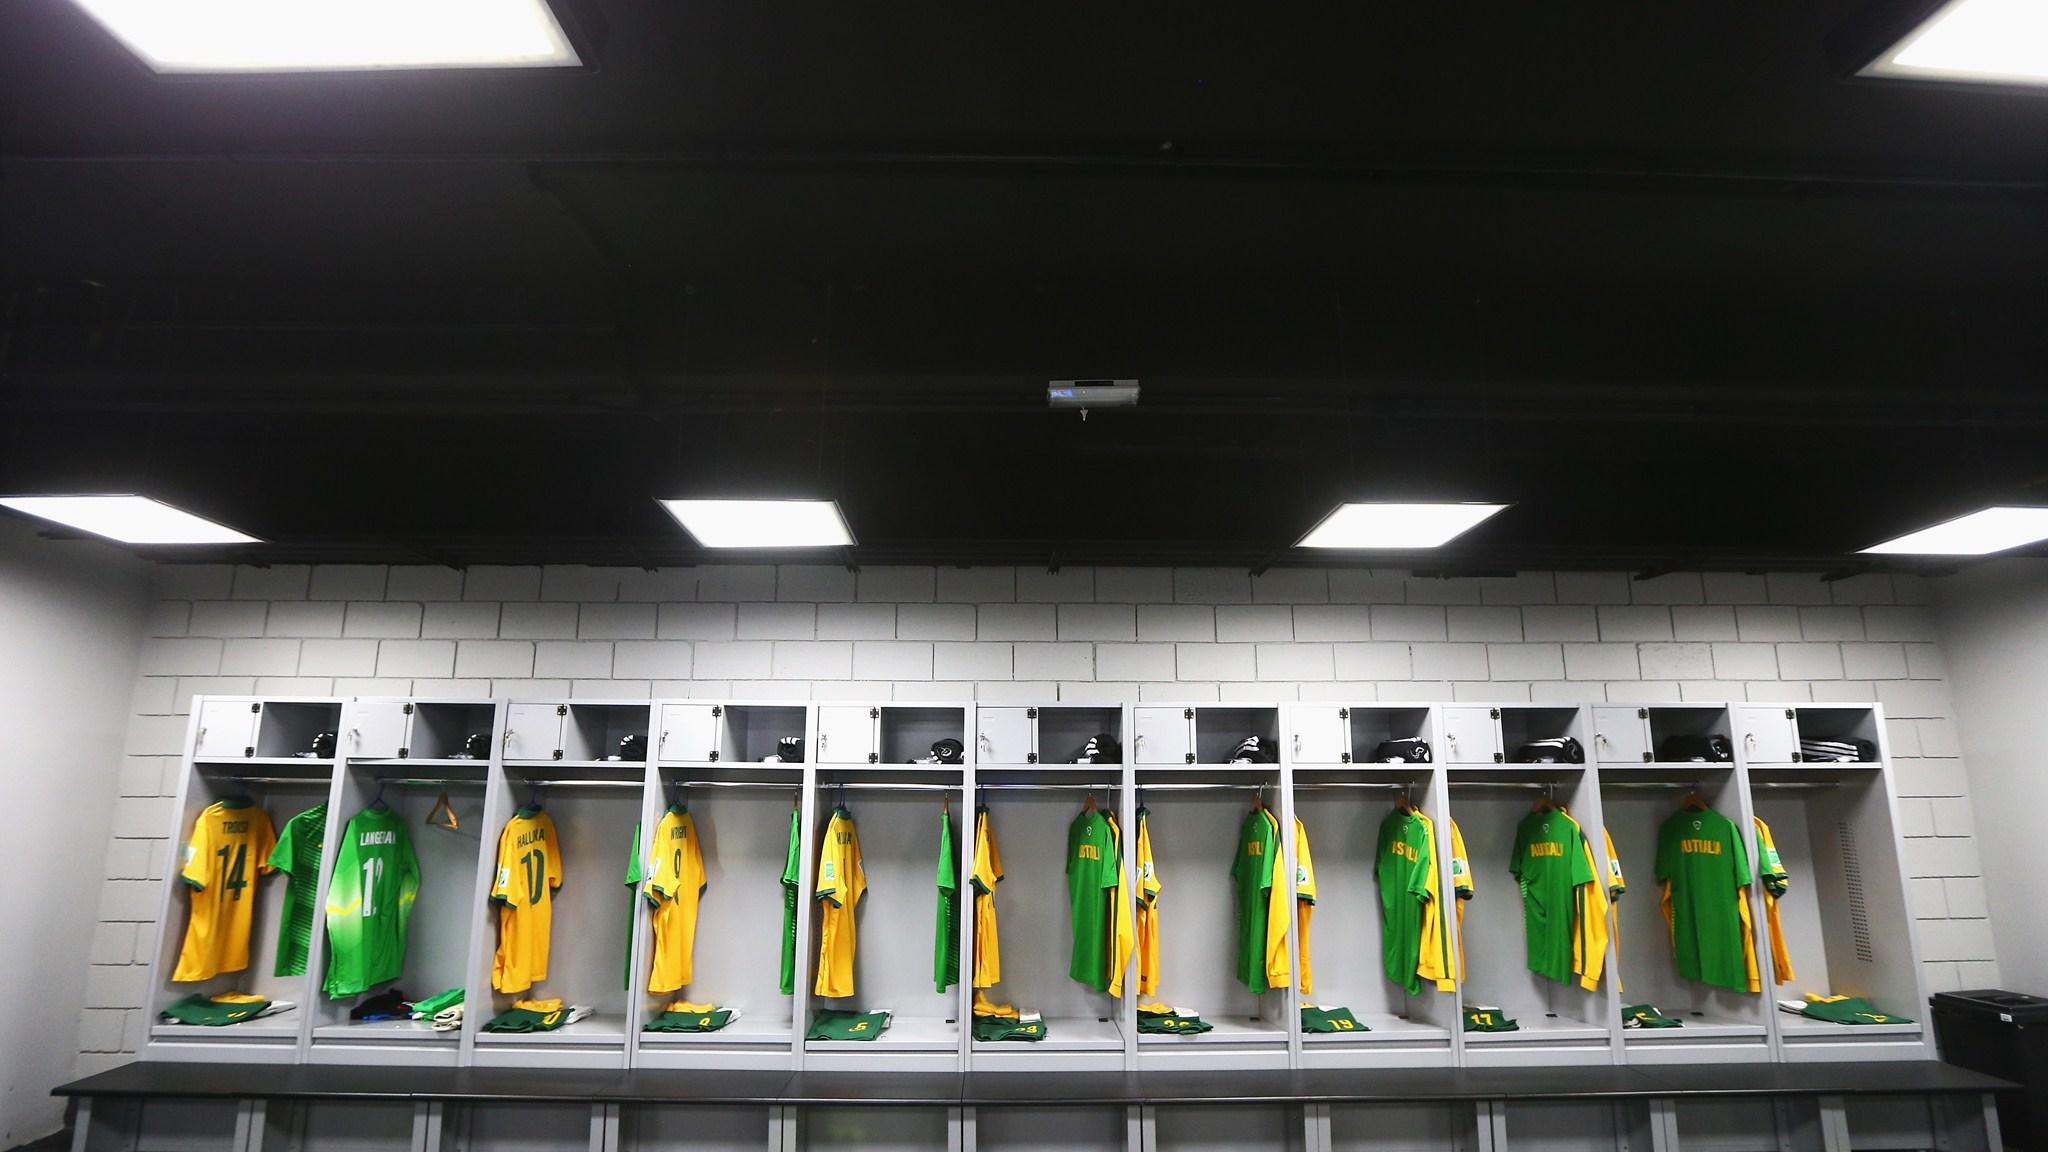 102 - Australia-Spain [0-3] -- 23 Jun 2014 - 13-00 - kuaza